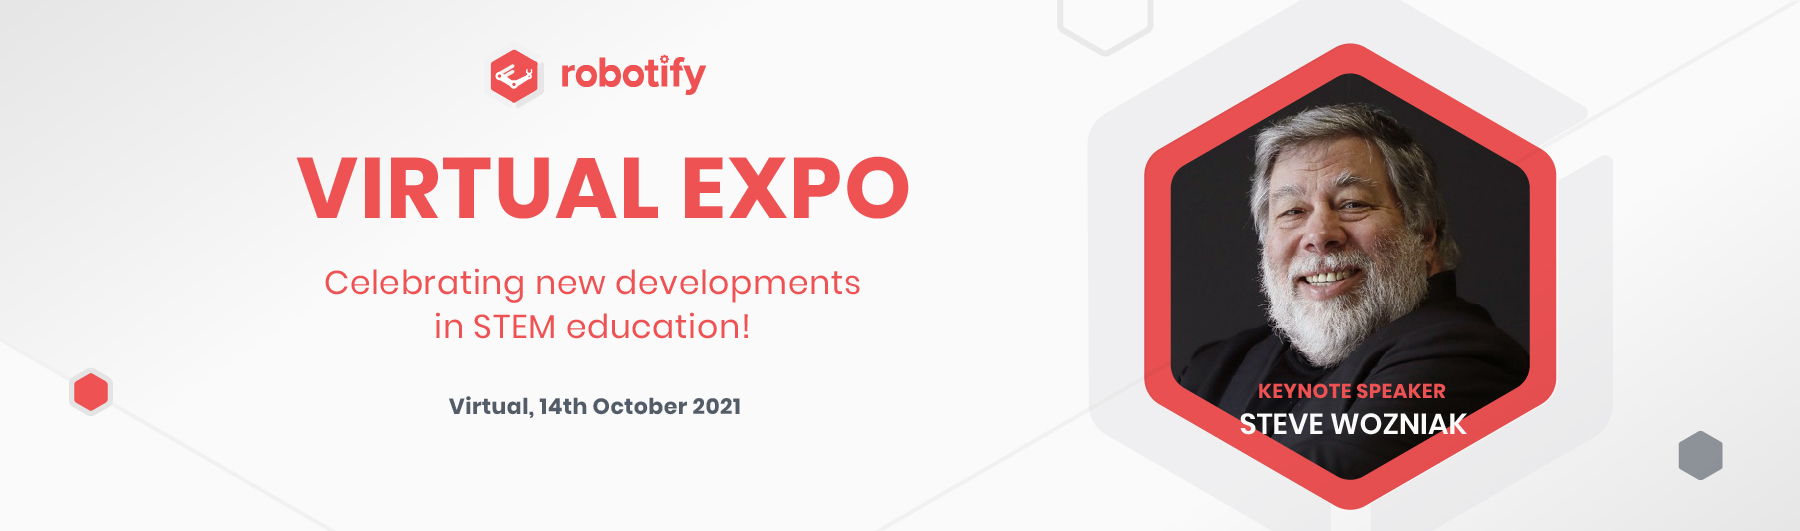 Robotify Expo 2021